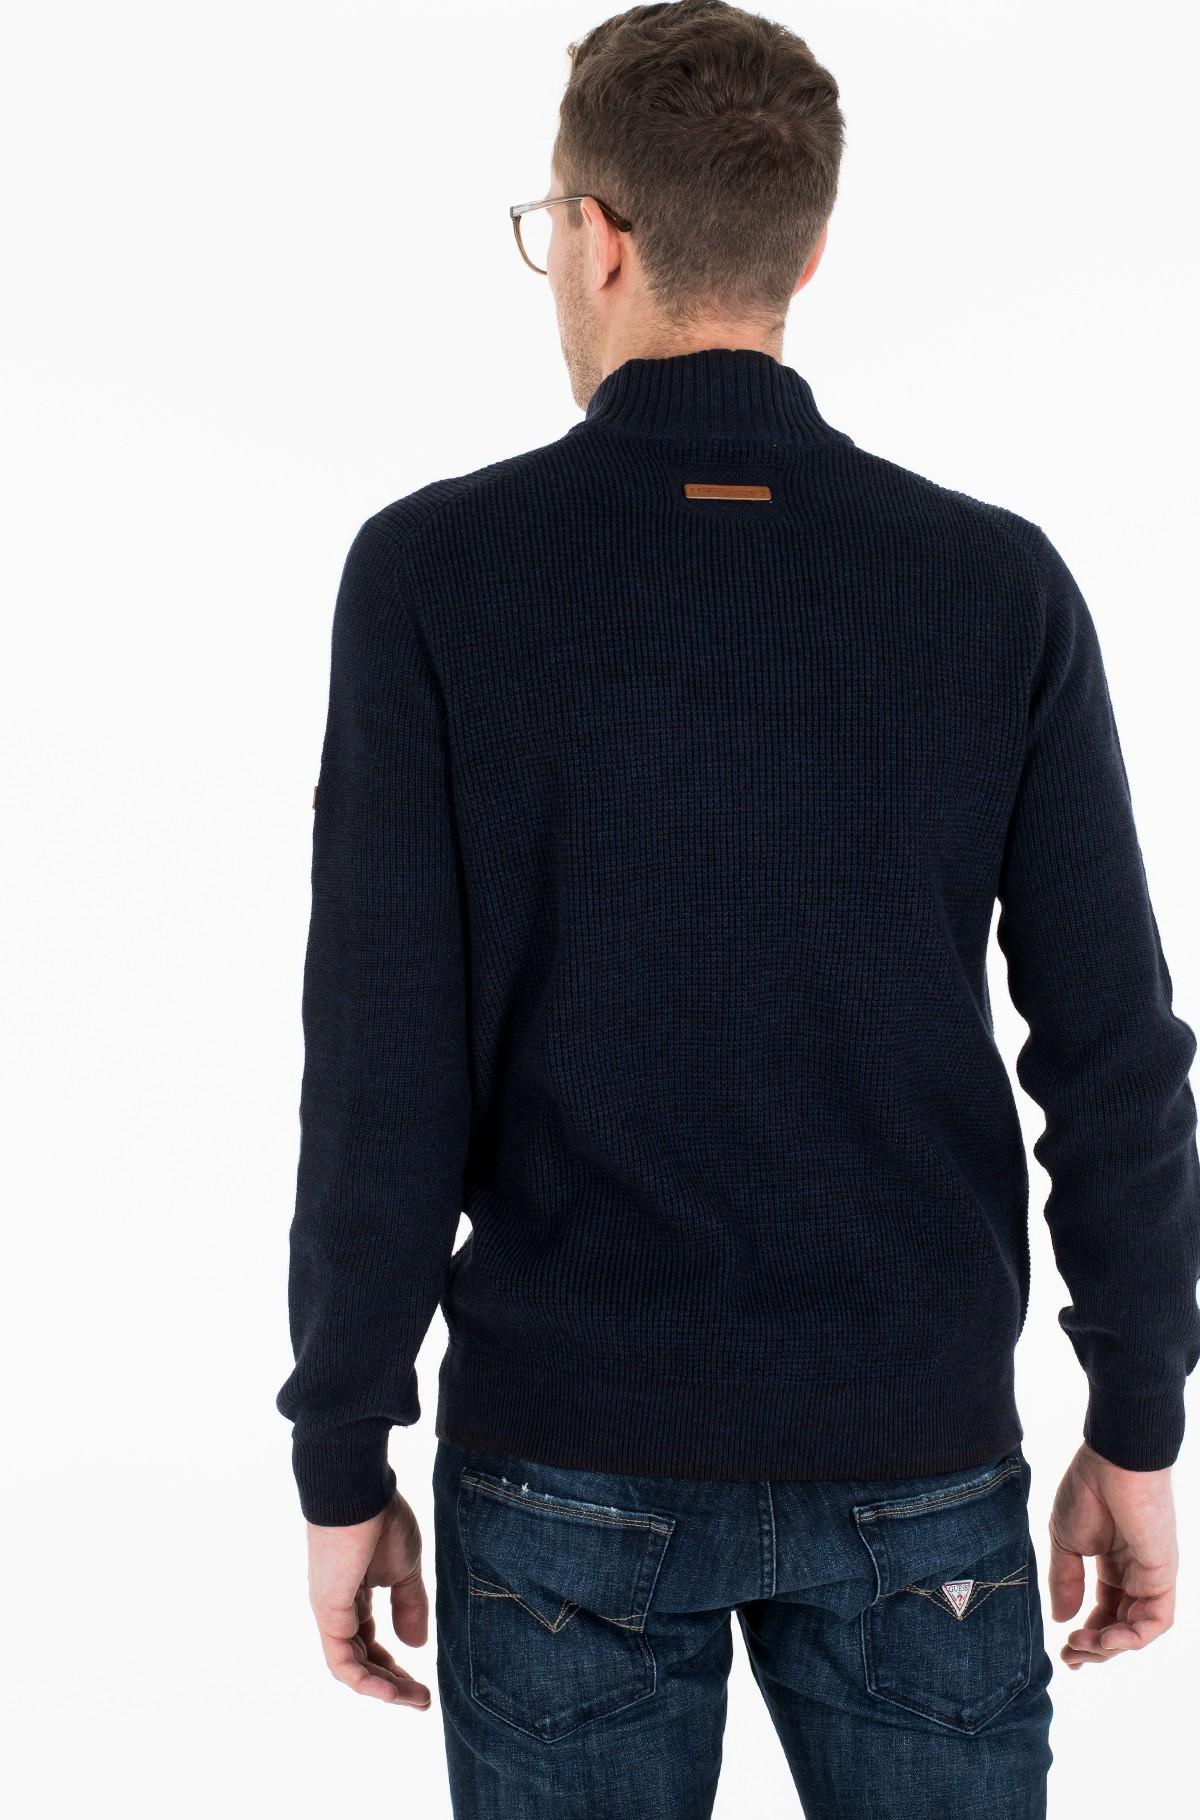 Sweater 31.124133-full-2